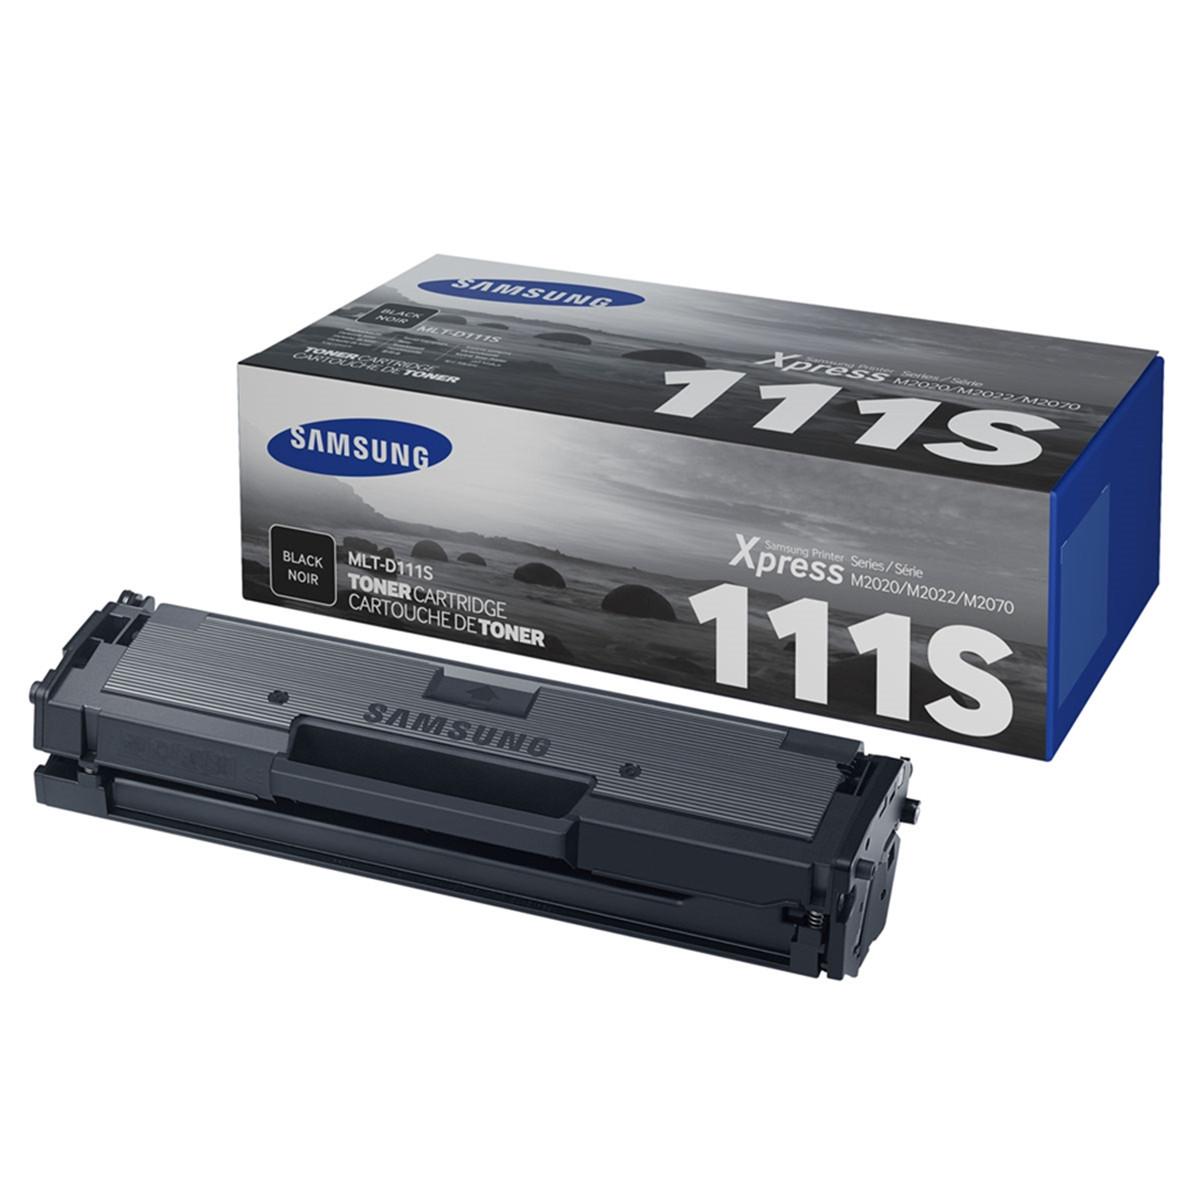 Toner Samsung MLT-D111S   M2020 M2070 M2020W M2020FW M2070W M2070FW   Original 1k